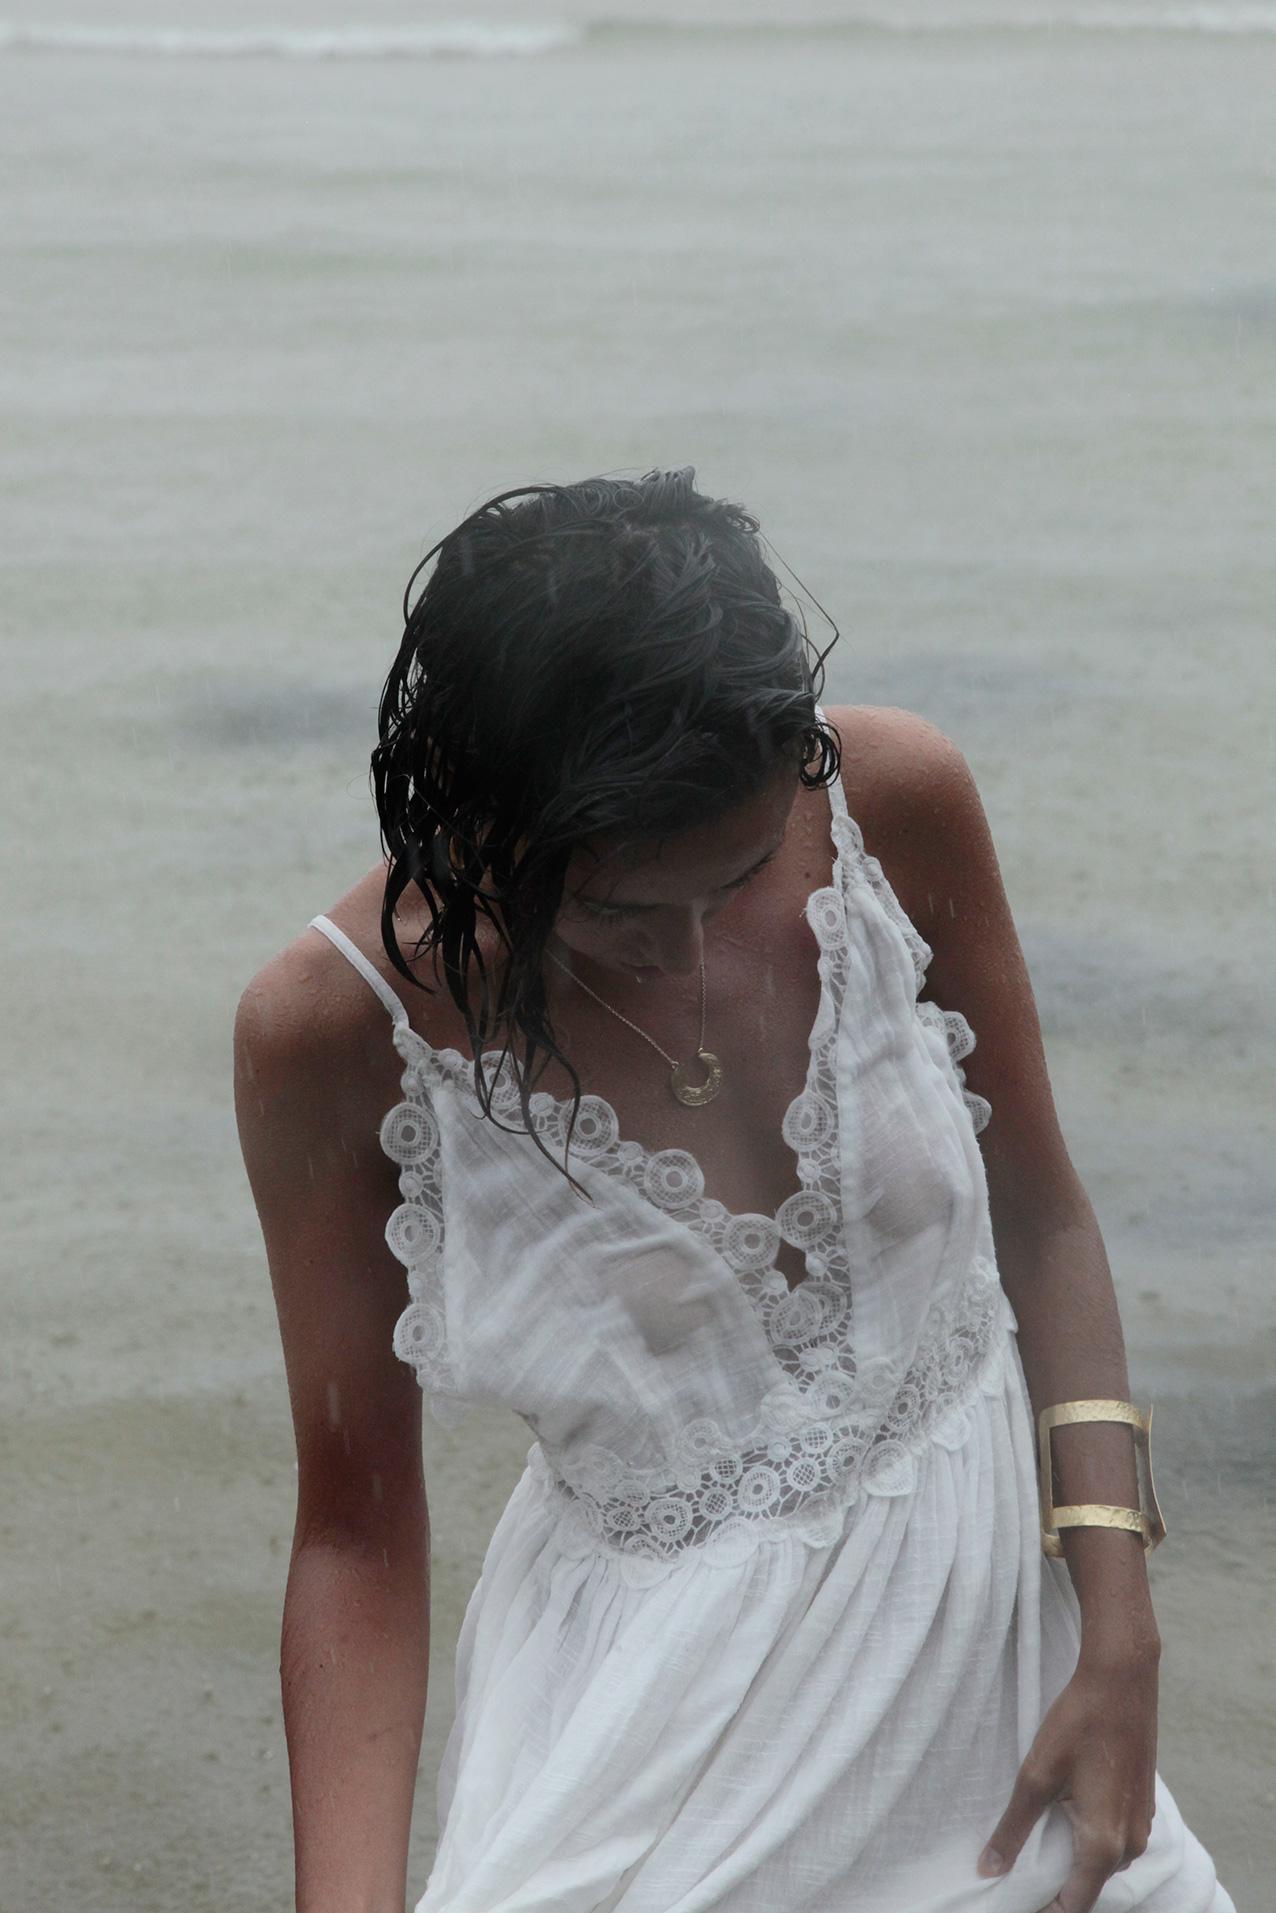 white_romancti_dress-curvy_hair-water-thailand-cool_lemonade-streetstyle-outfit